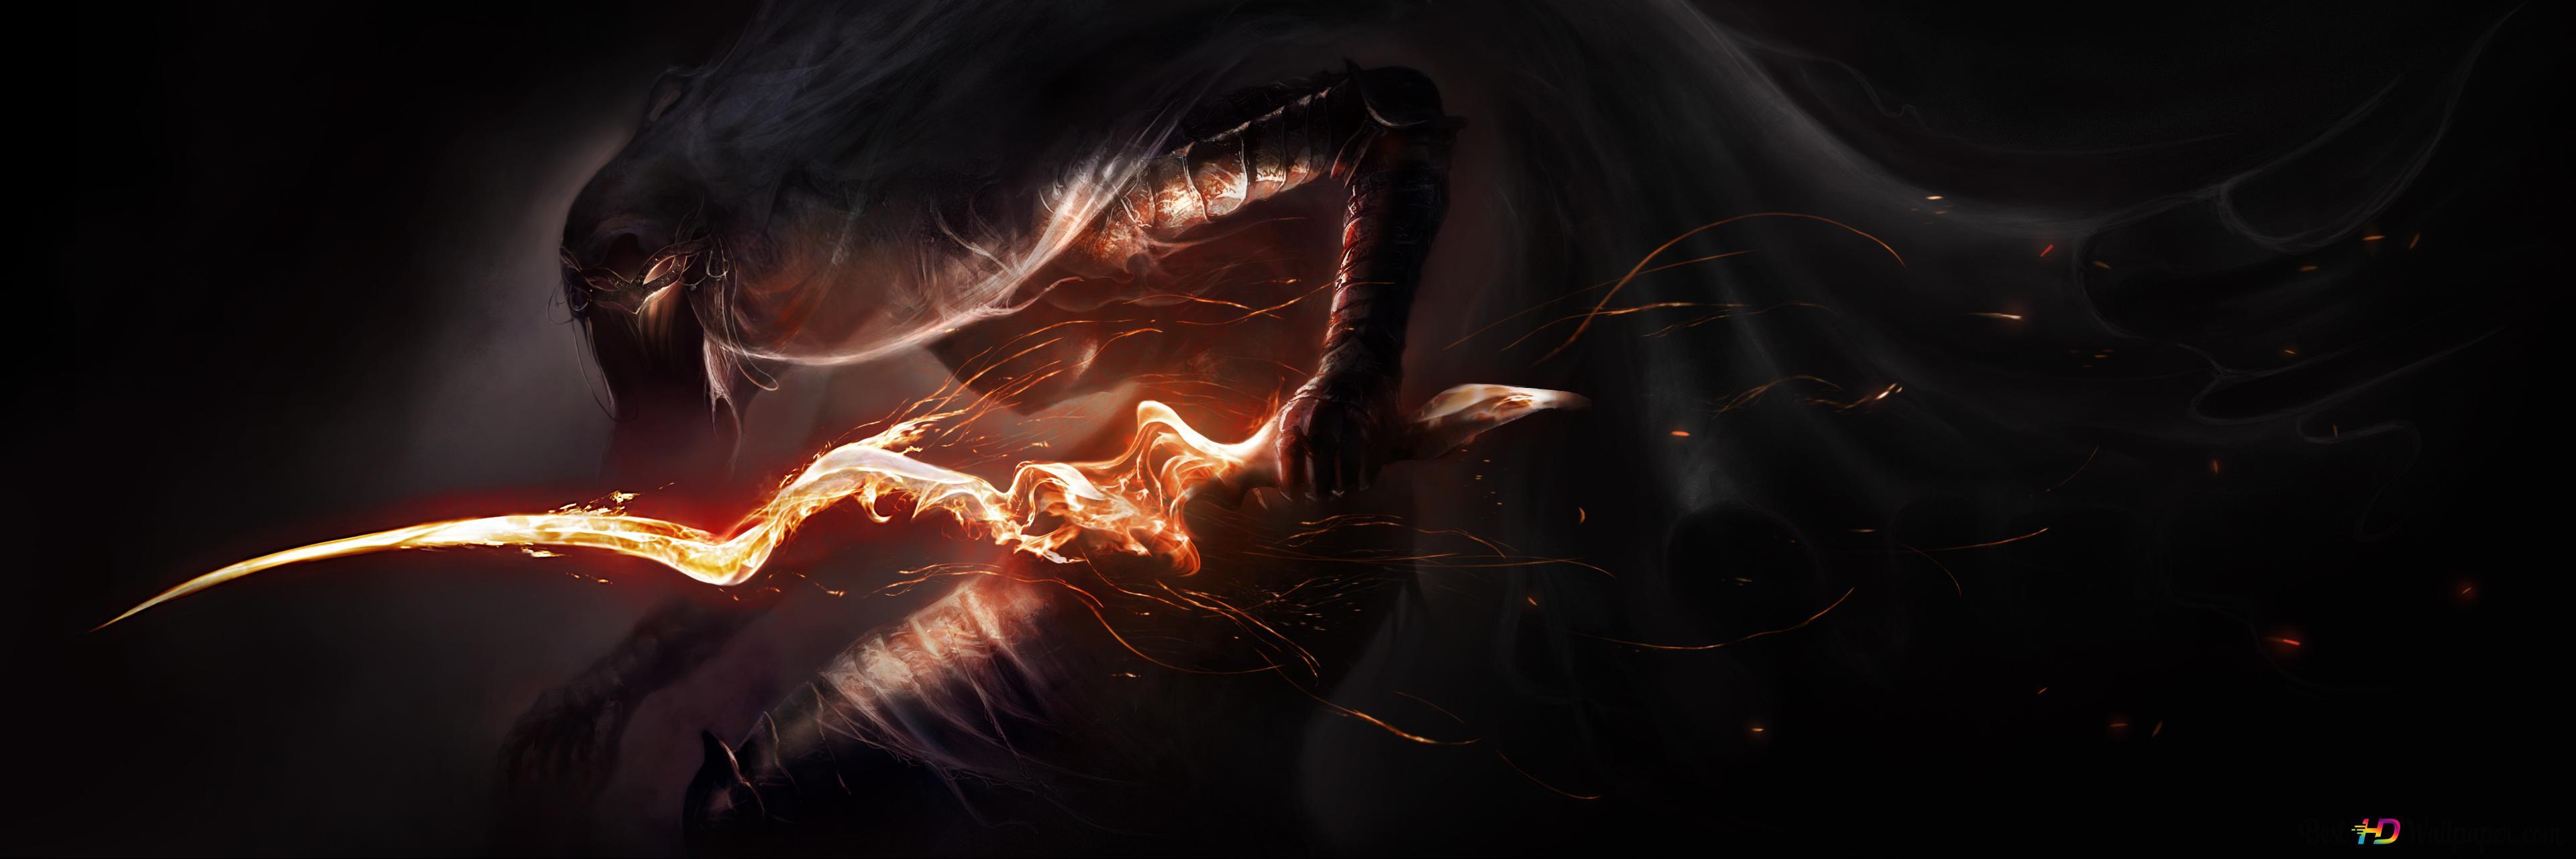 Dark Monster Venom Wallpaper Artworks Pictures Www Picturesboss Com